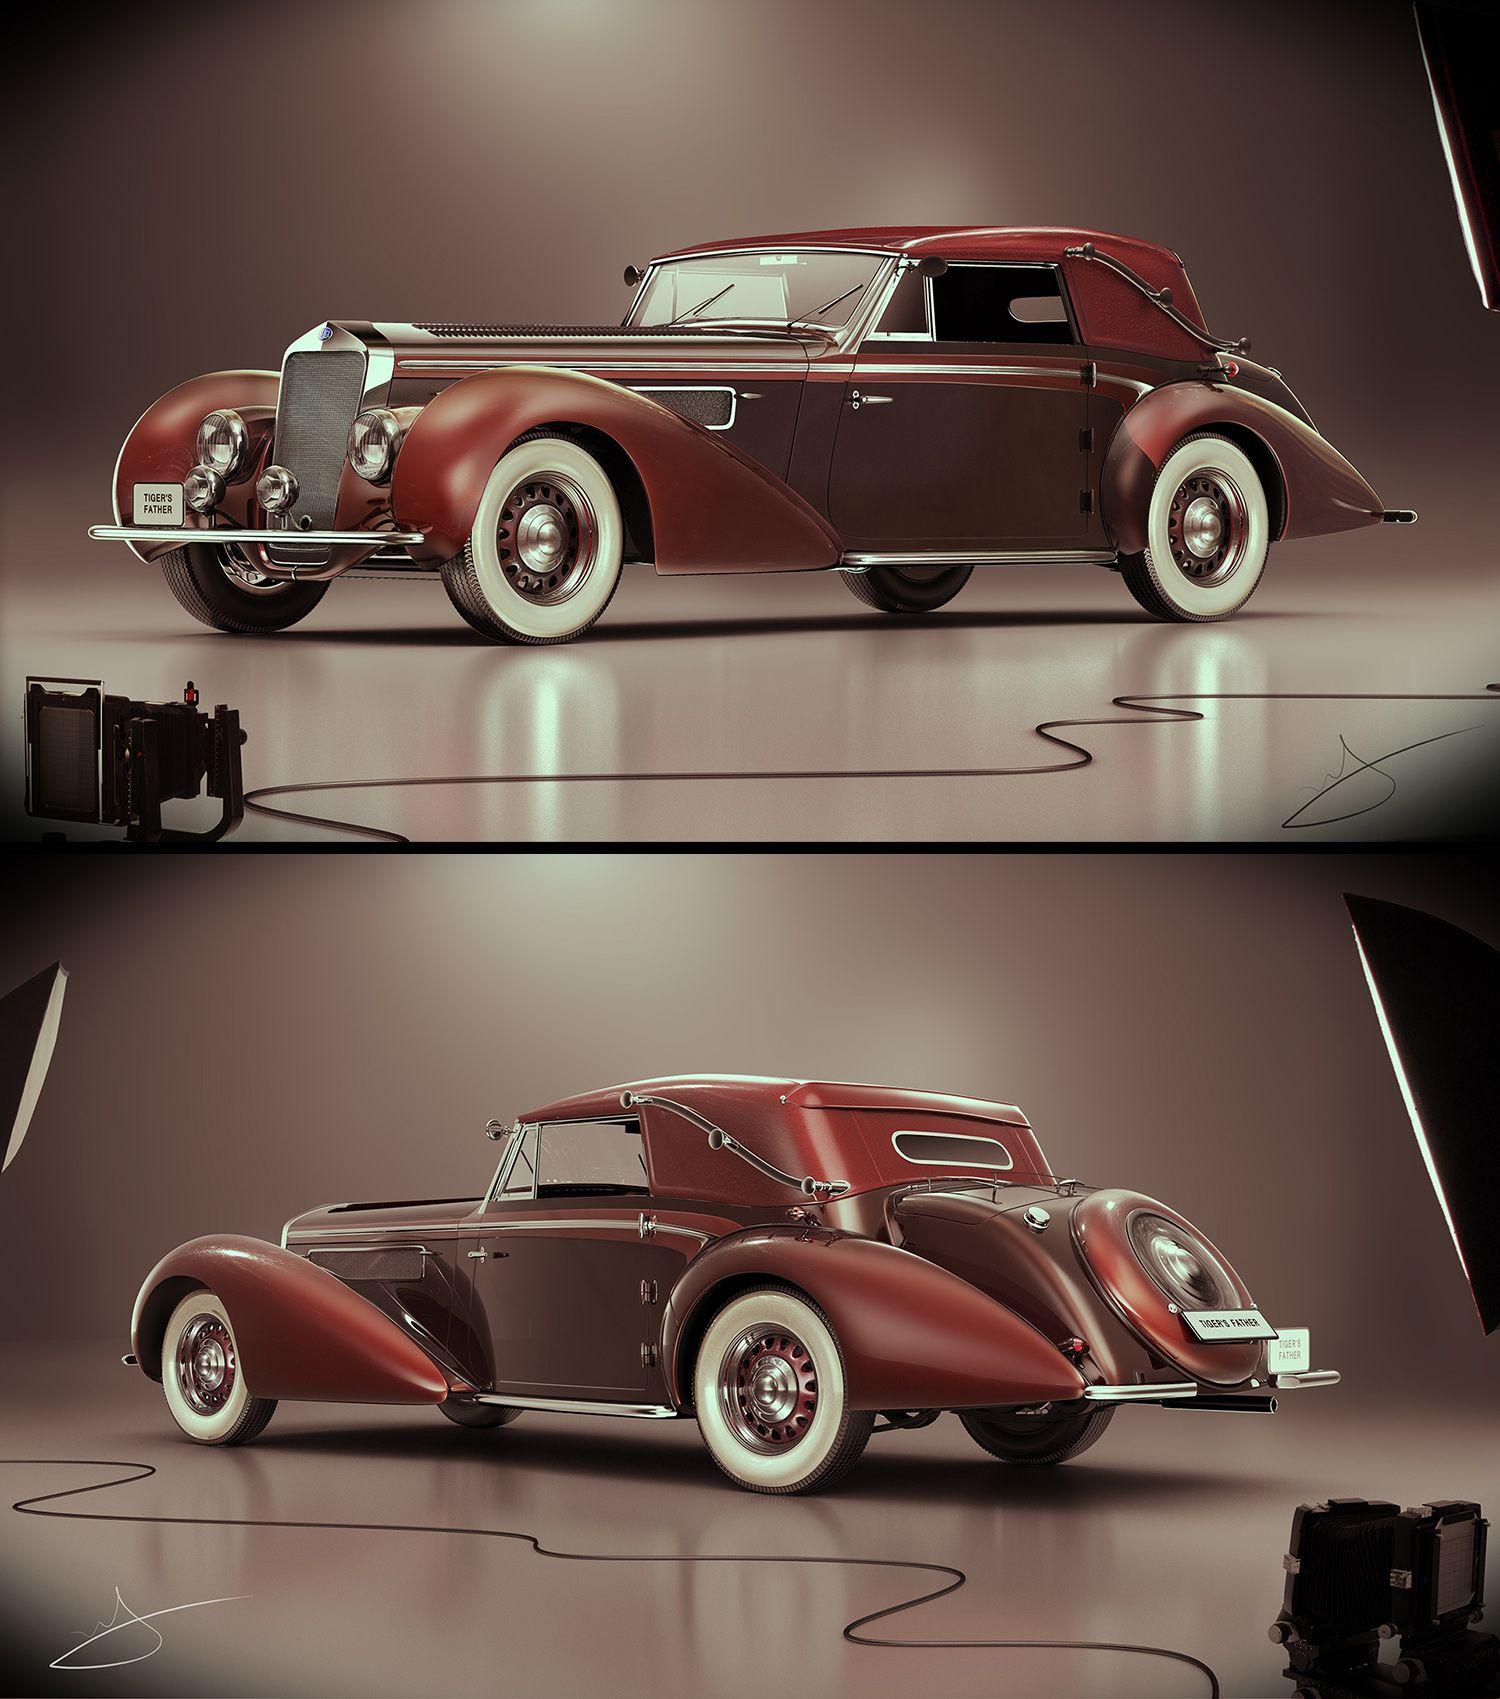 1939 Delage D8 120 Cabriolet Chapron by Alexandr Novitskiy